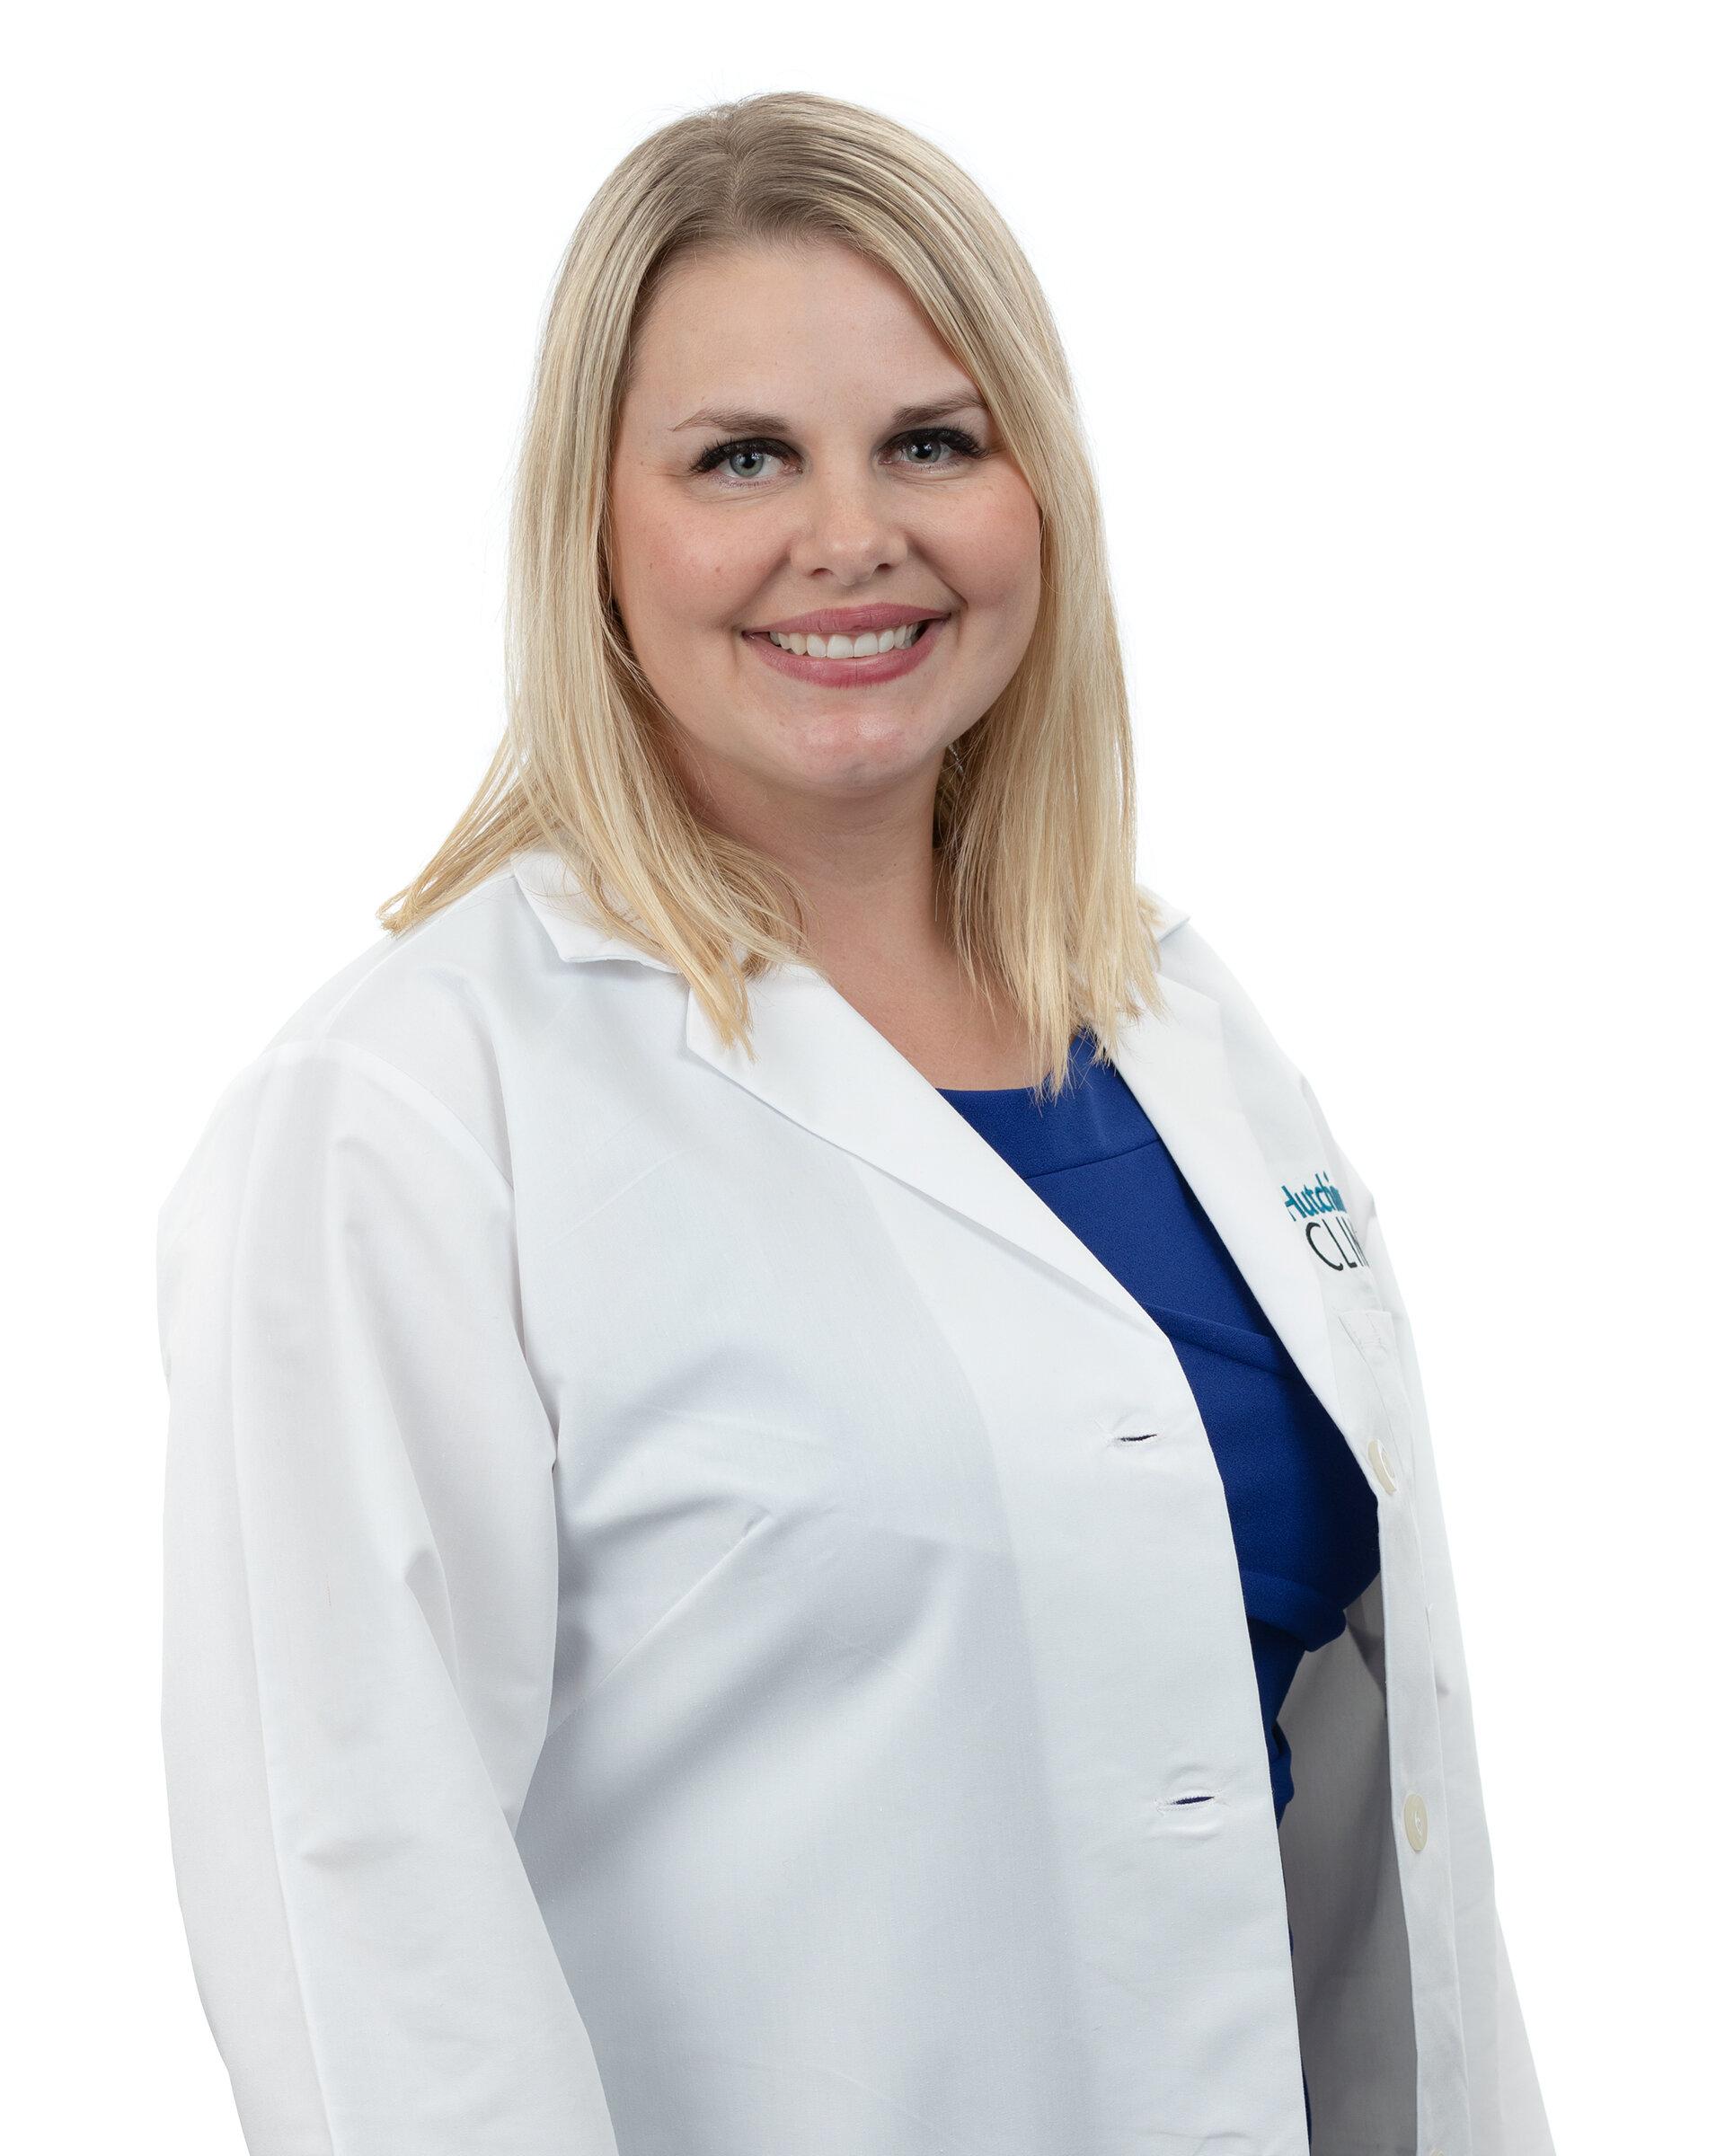 Kirsten Paulsrud, DPM